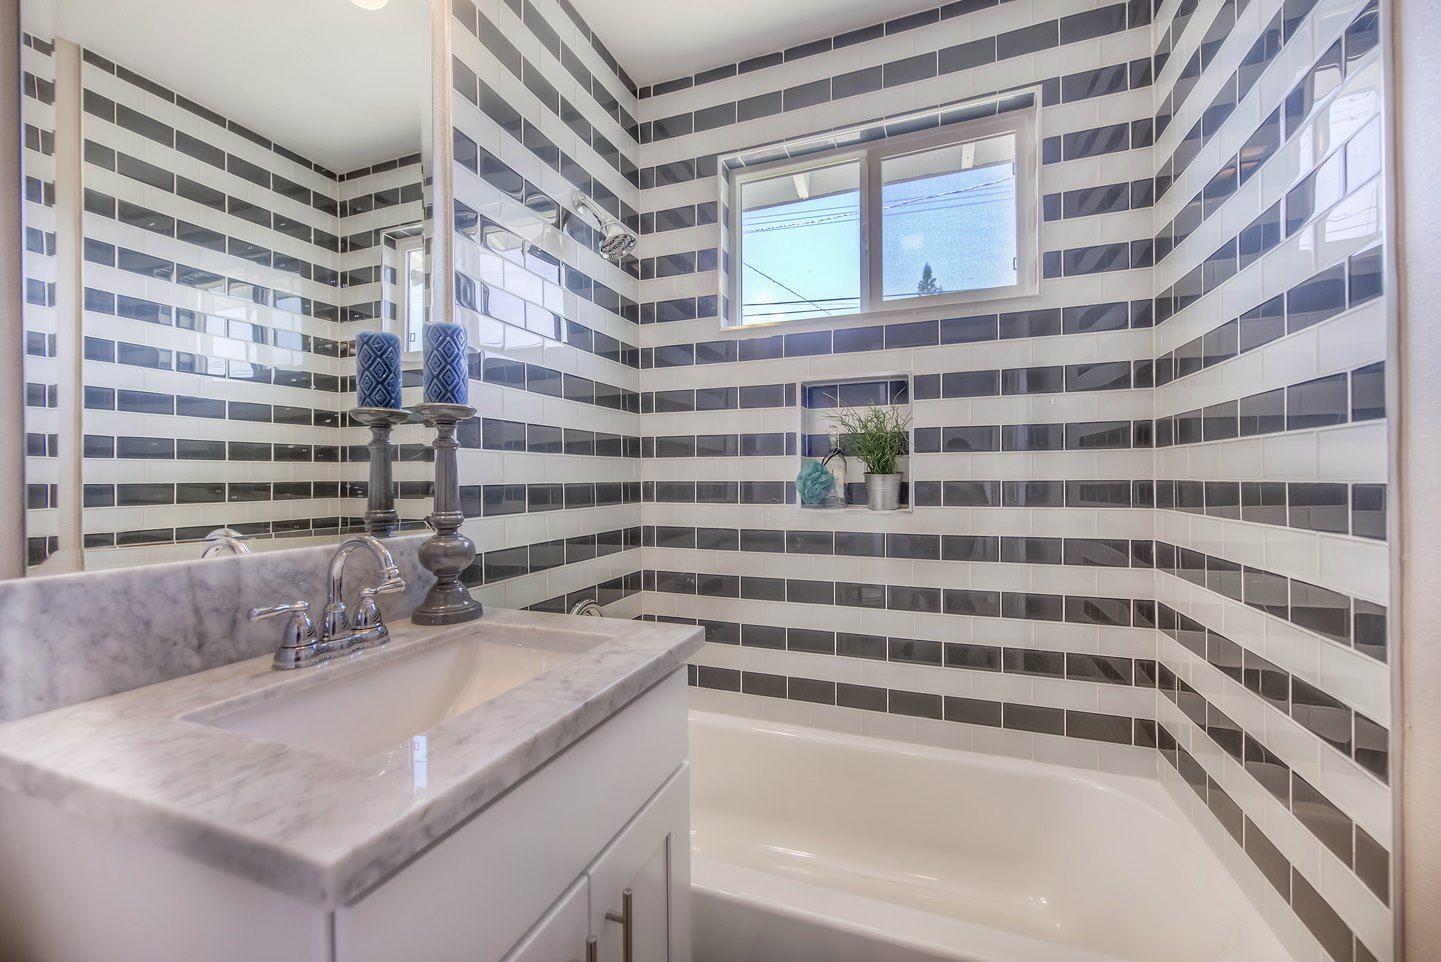 Bathroom Remodeling Contractors Tc Construction Design